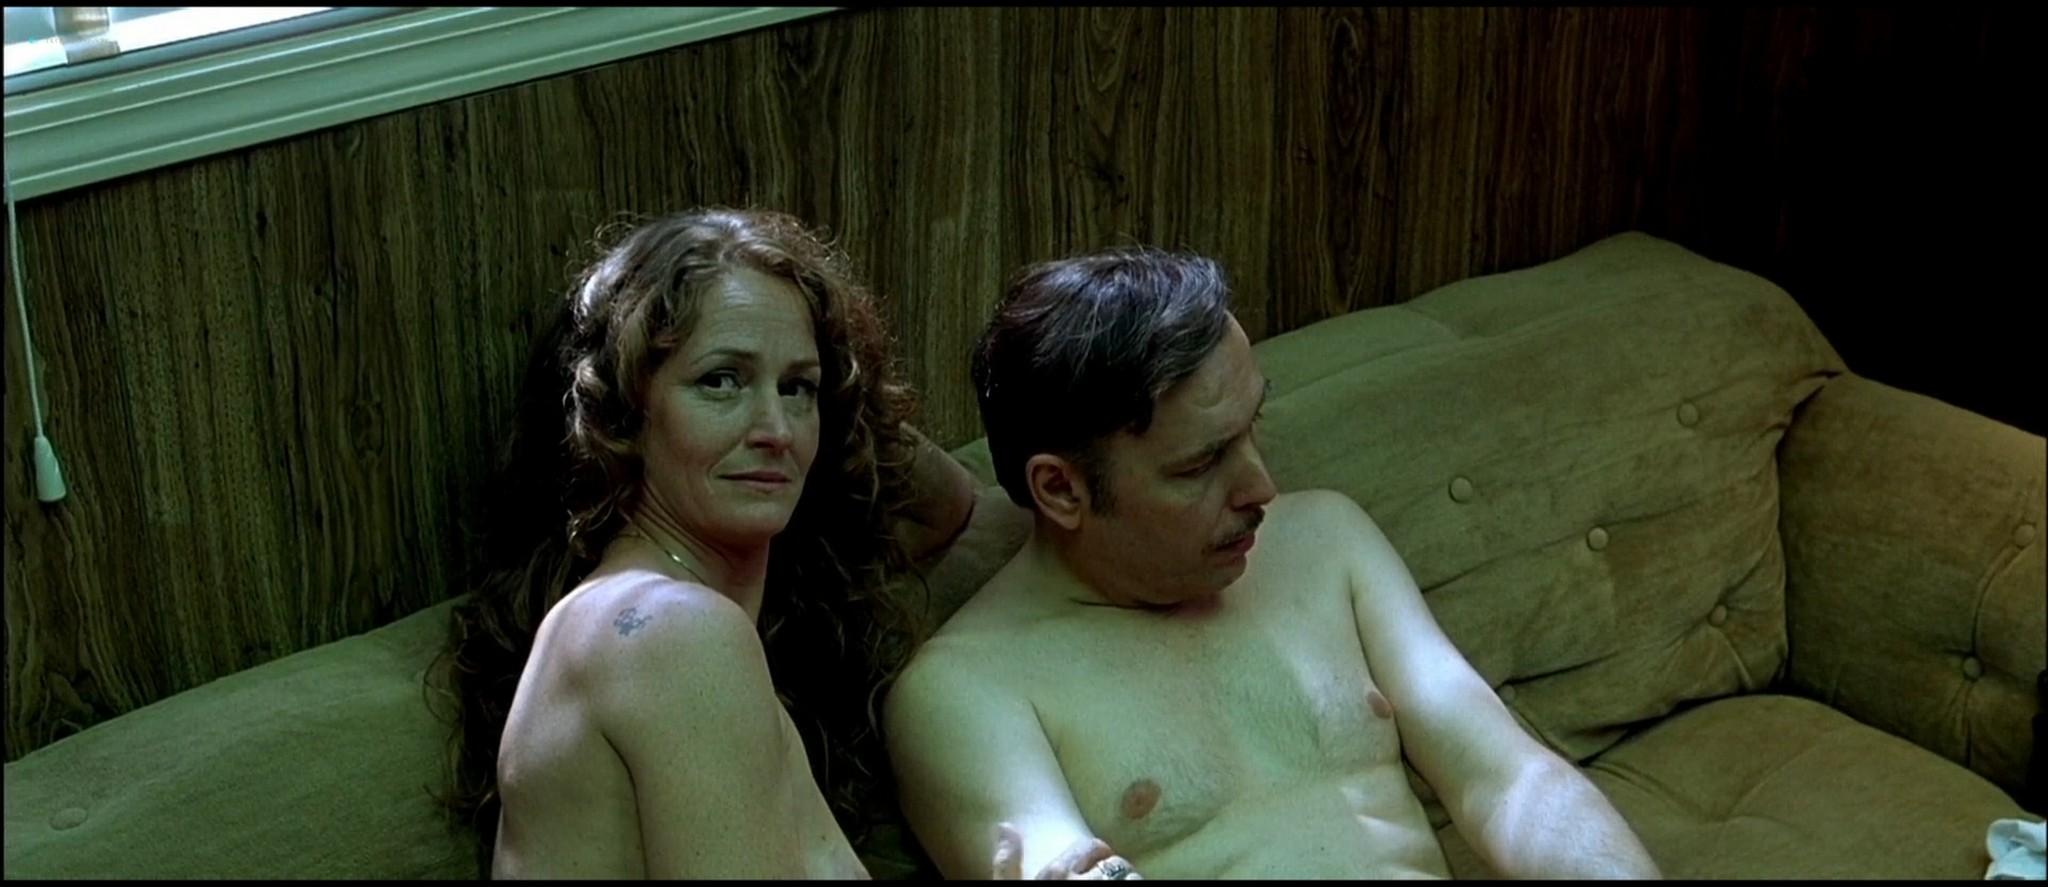 January Jones sex doggy style and Melissa Leo naked - The Three Burials of Melquiades Estrada HD 1080p BluRay (3)